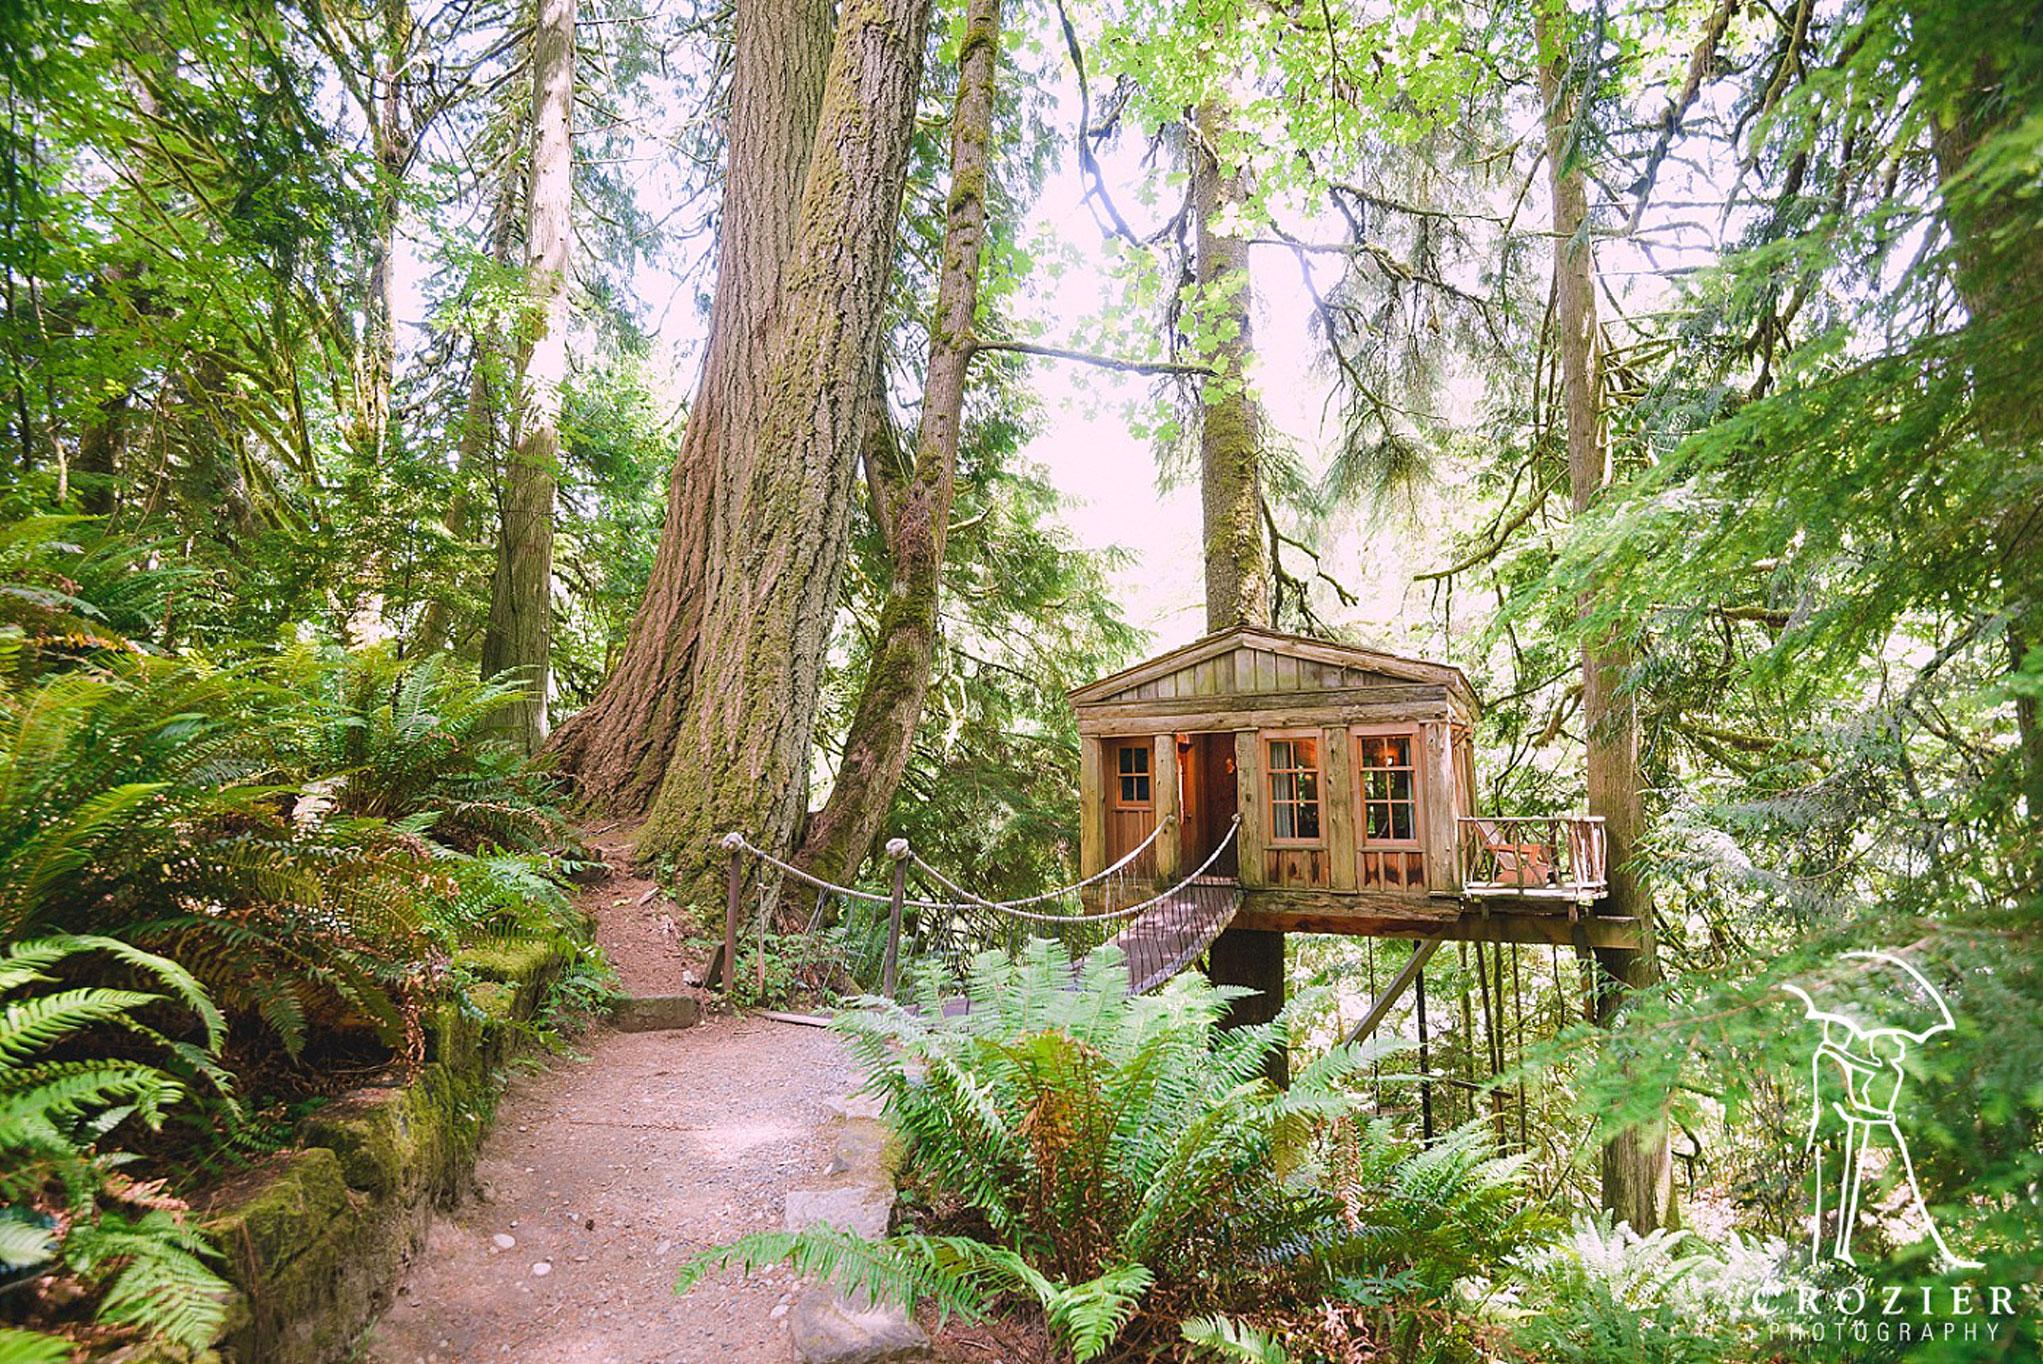 Charming Treehouse Fall City Wa Part - 6: TreeHouse Photos At Treehouse Point In Fall City Washington